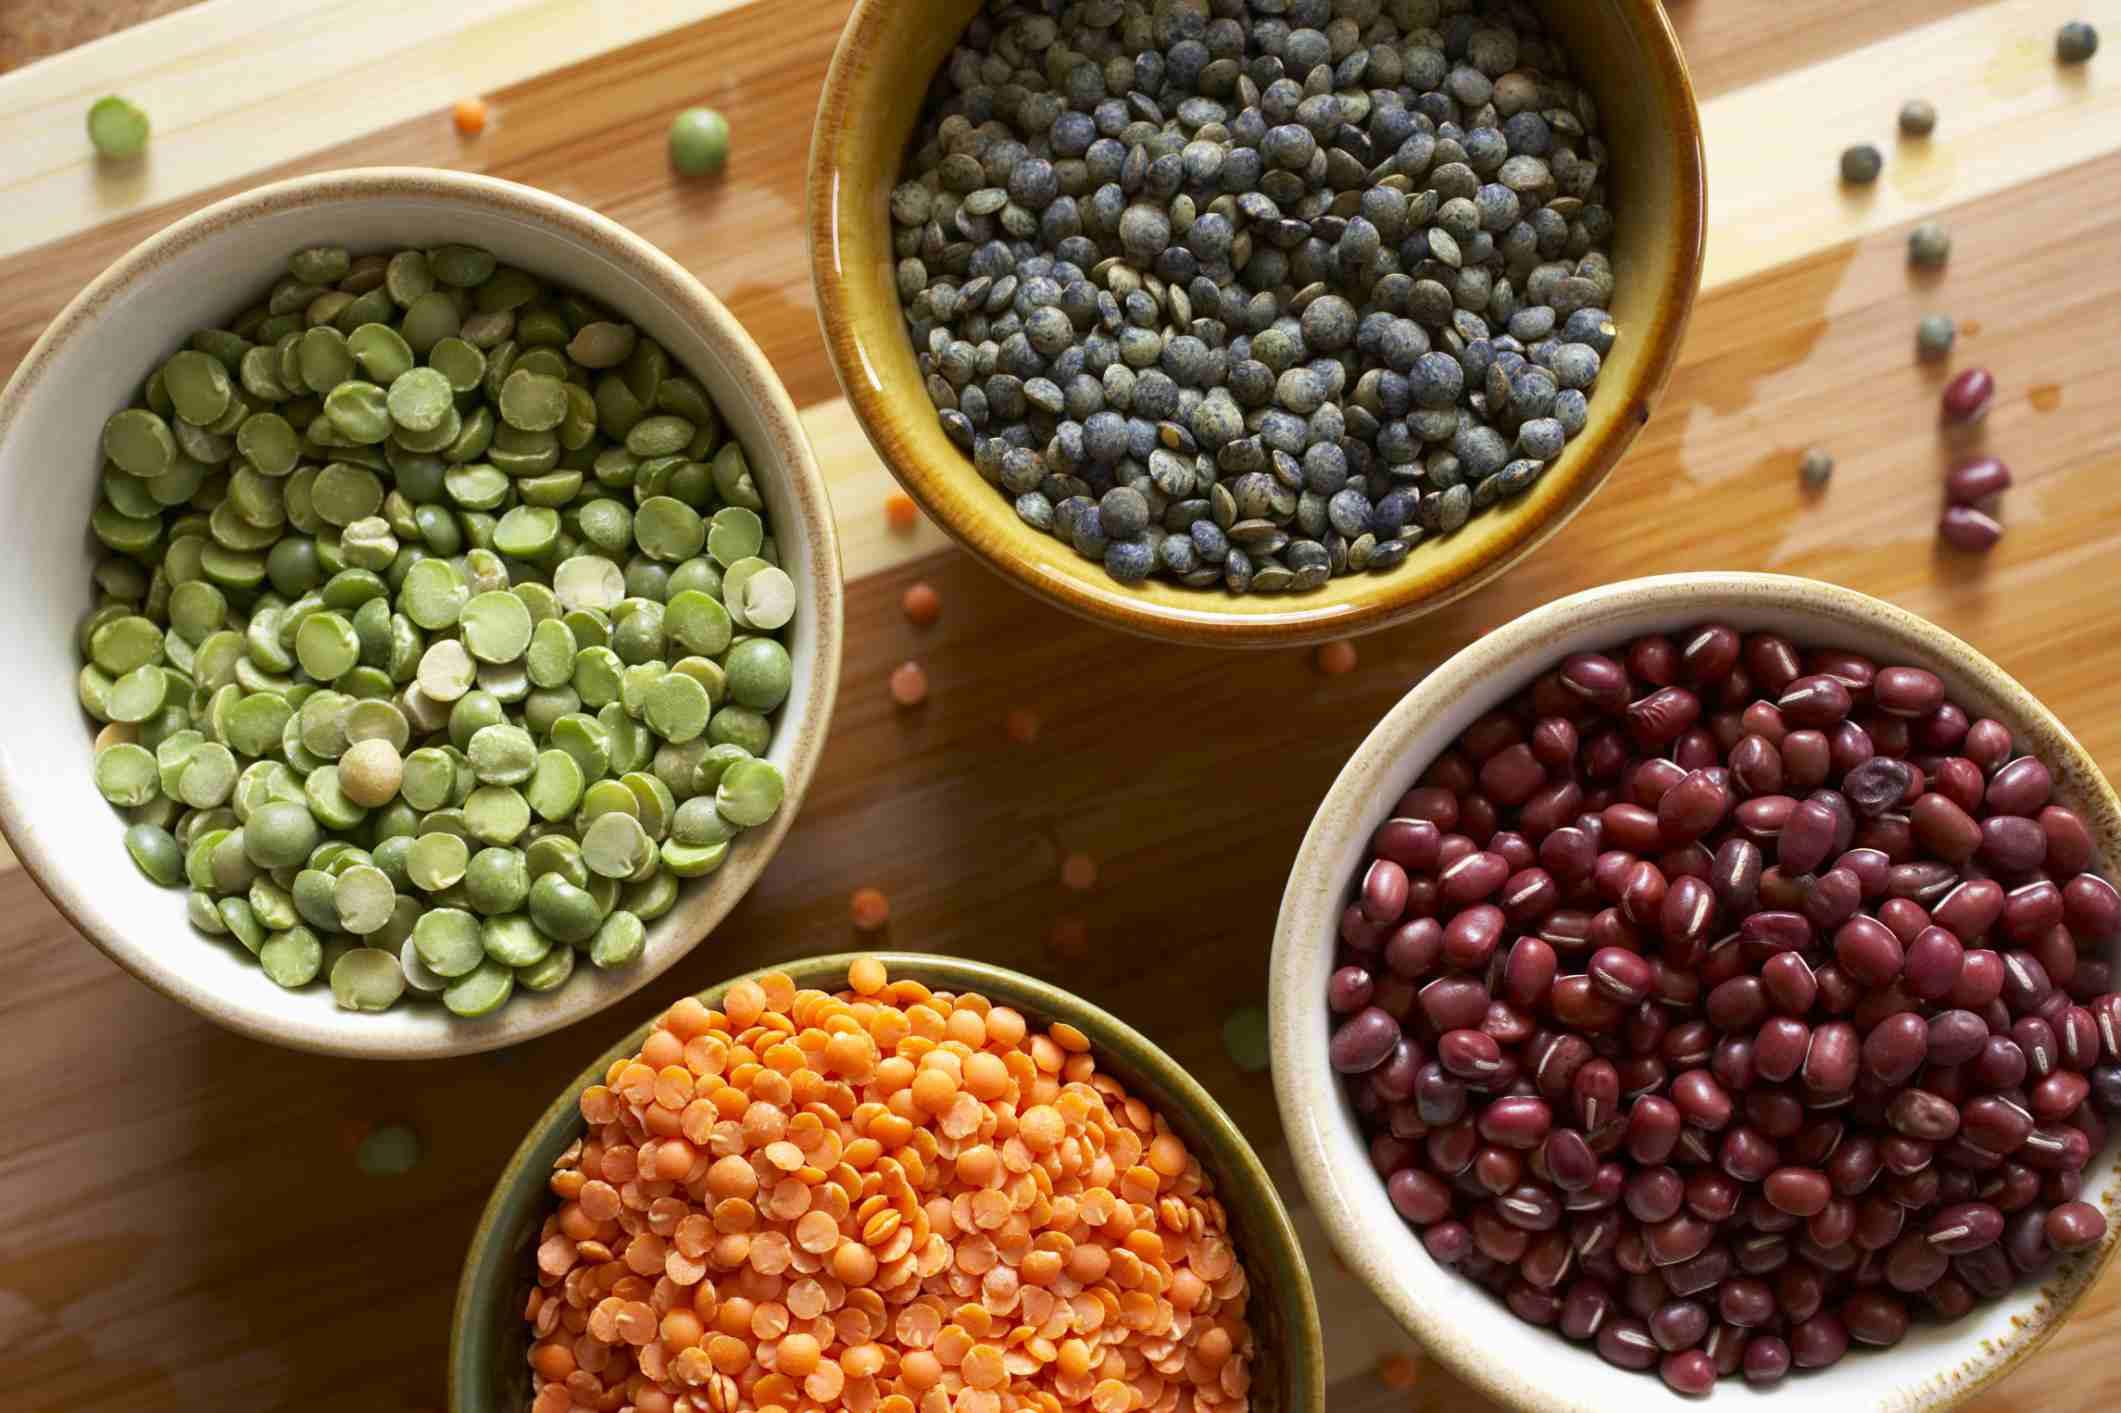 fibra en legumbres, alimentos ricos en fibra, alimentos con fibra, fibra, fibra soluble,